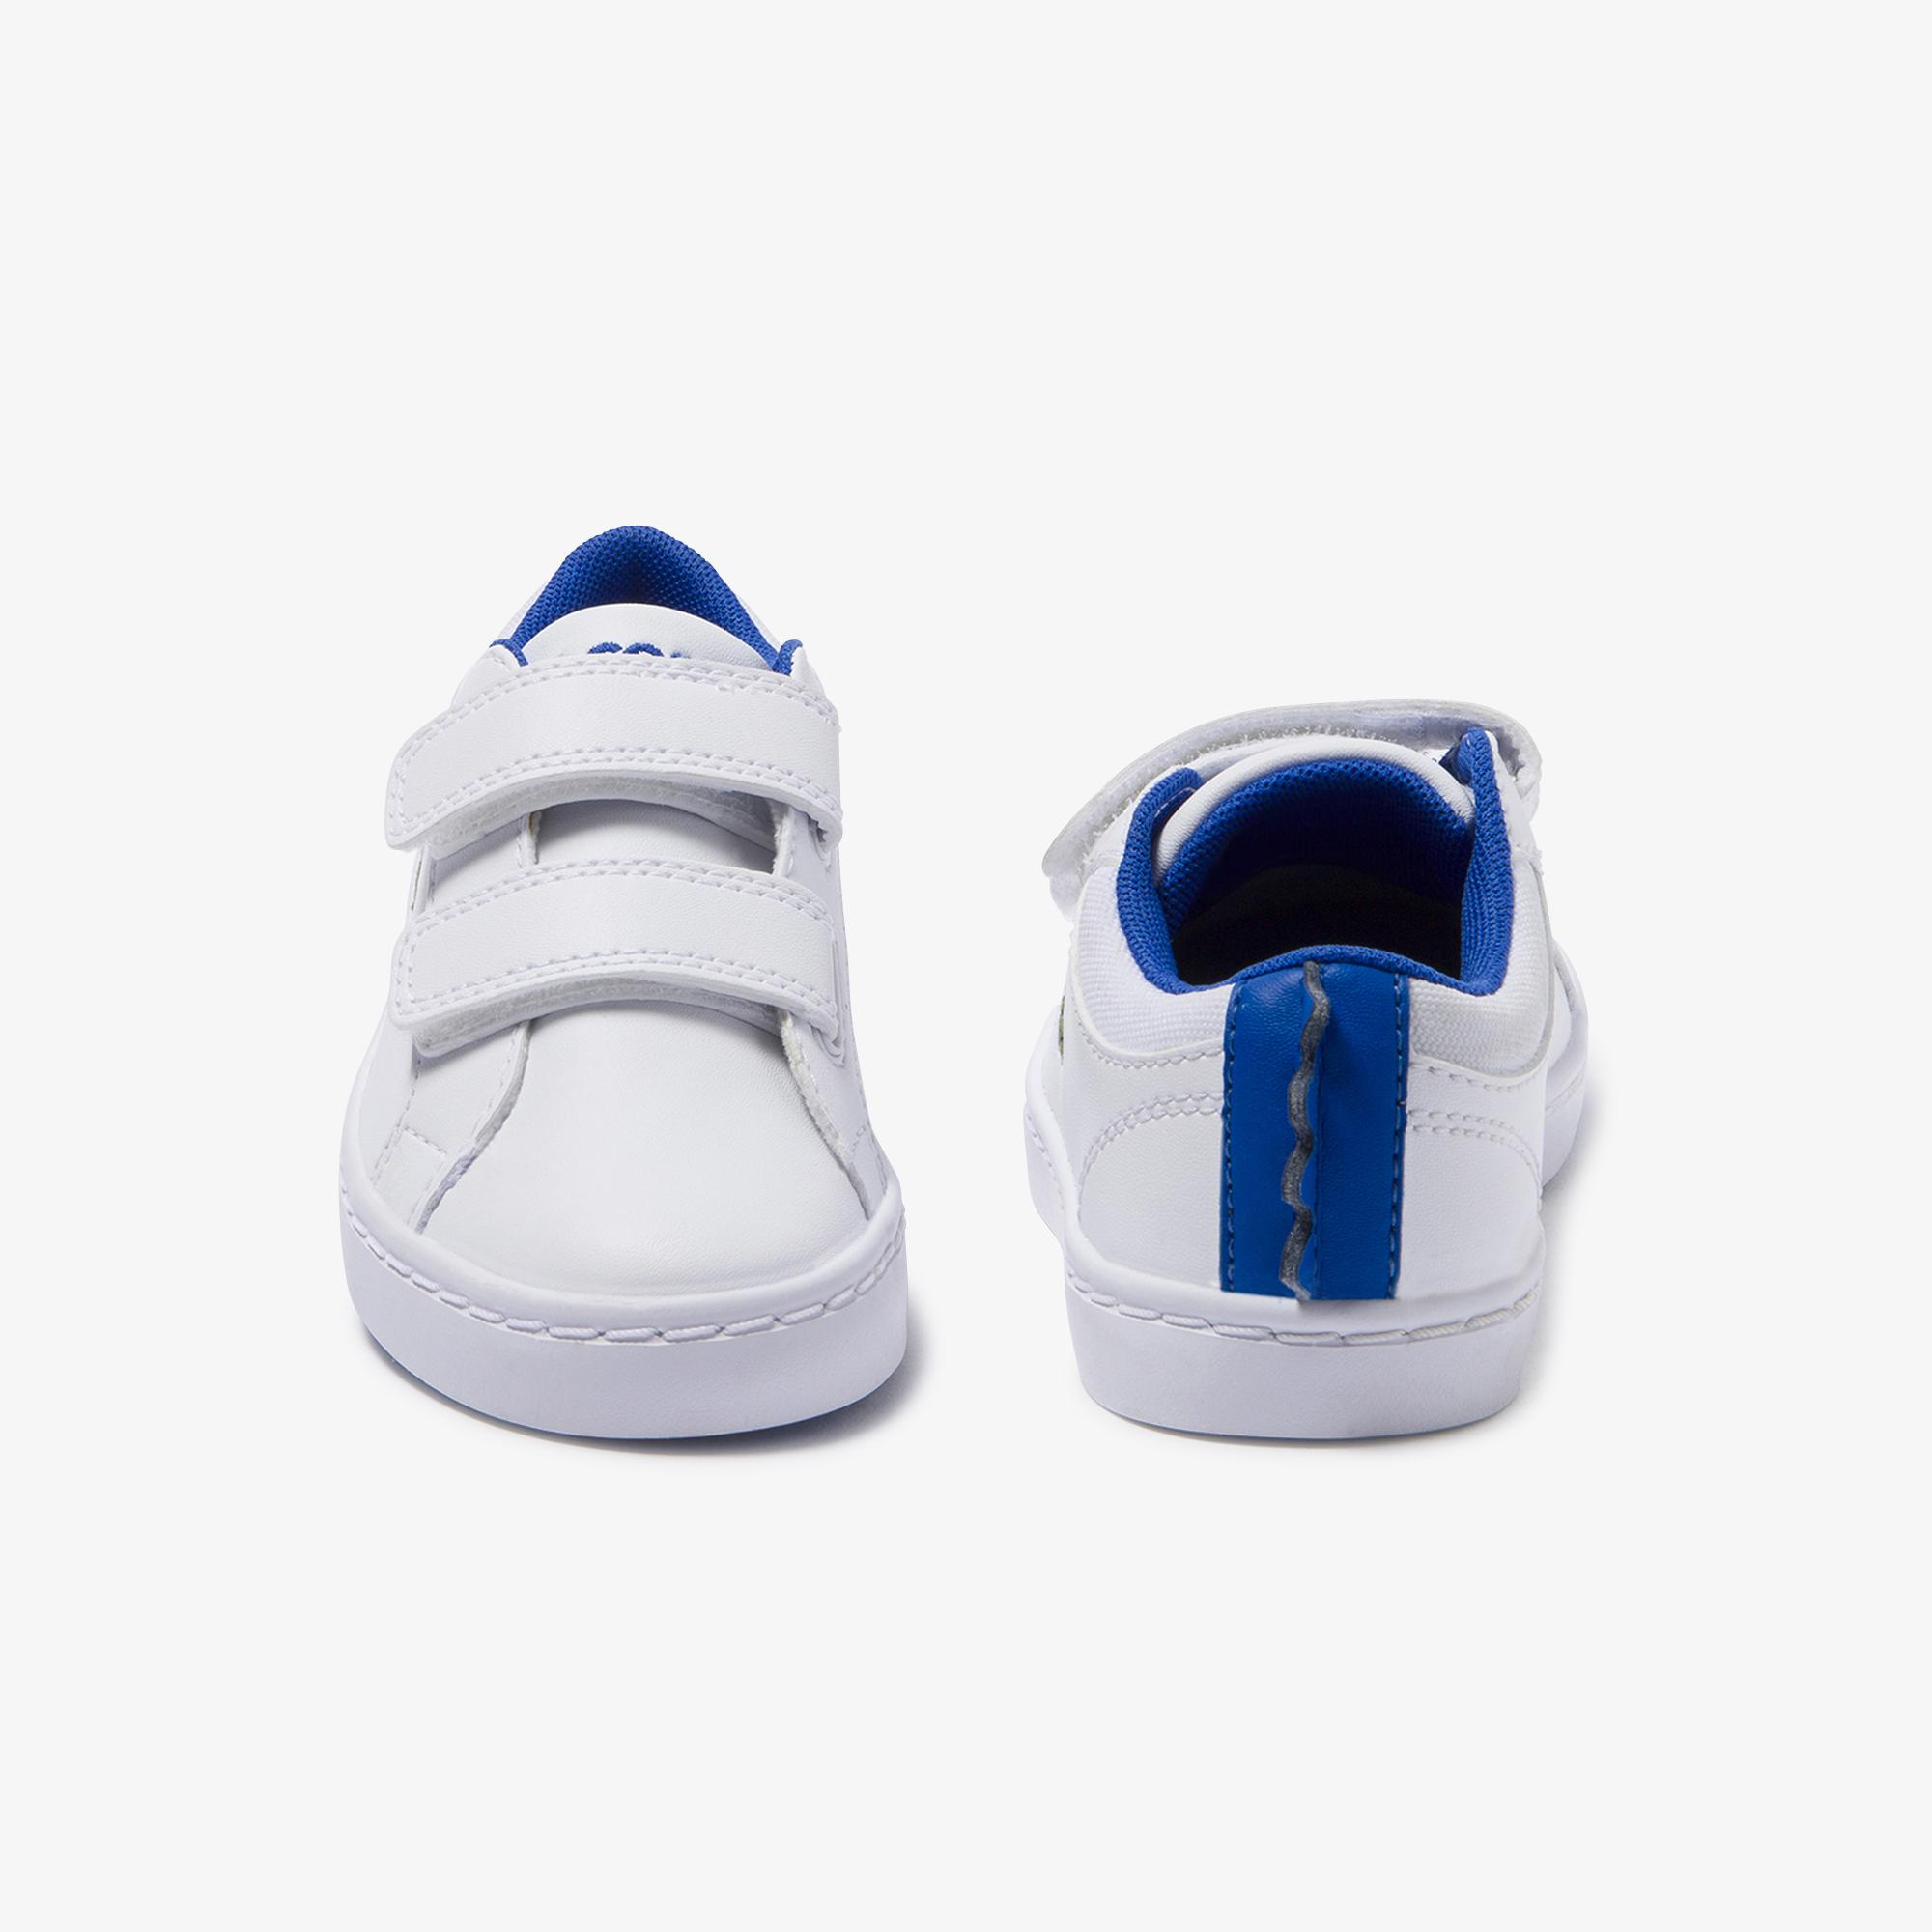 Lacoste Straightset 120 1 Cui Çocuk Beyaz - Mavi Sneaker